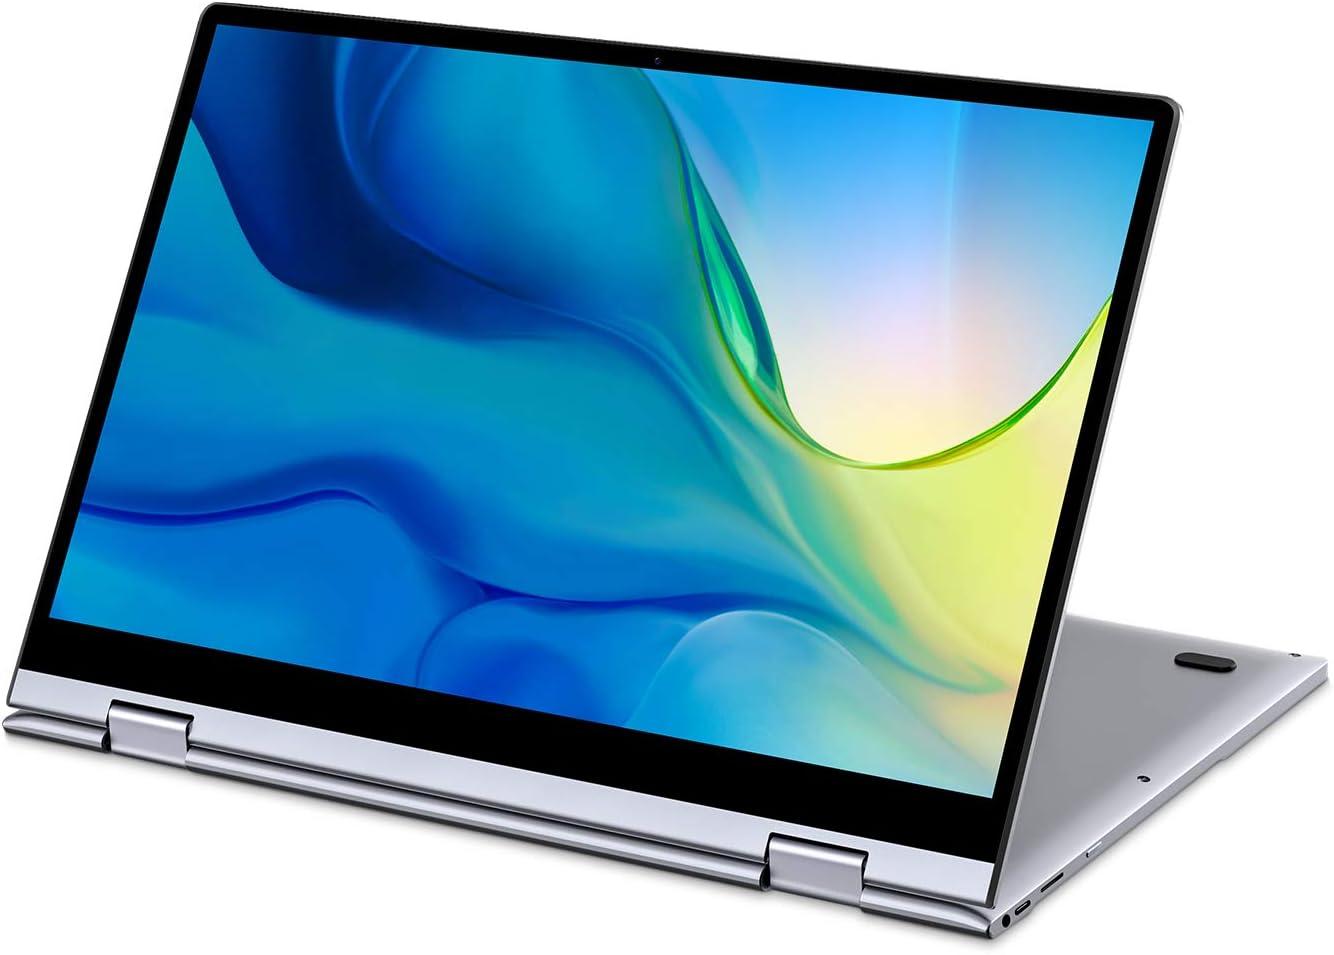 "BMAX 13.3"" Convertible 2 in 1 FHD Touchscreen Laptop, 8GB DDR4, 256GB M.2 SSD, Intel Quad-Core Celeron N4120, 2 Type-C Ports, LED Backlit Keyboard, AC WiFi + BT 5.0, Windows 10, Webcam, All-Metal Body"